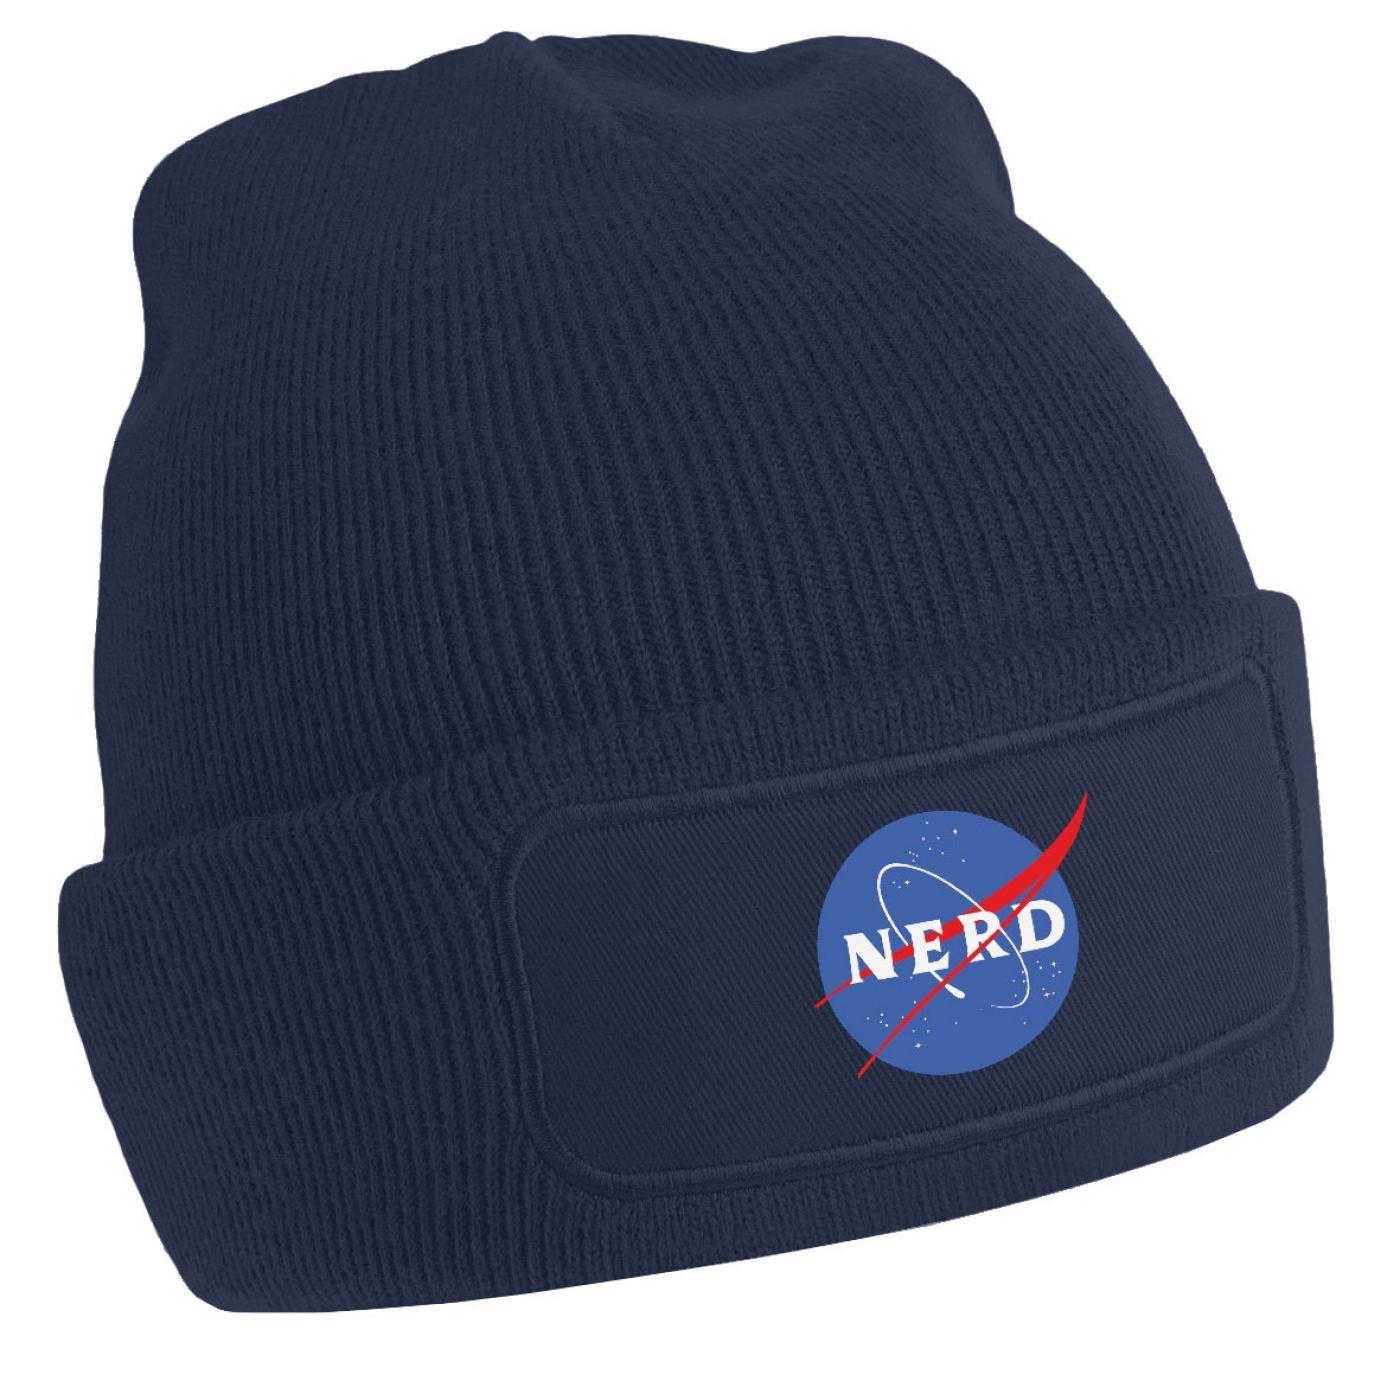 NASA NERD Logo beanie hat - Somethinggeeky 48ef89cfc016